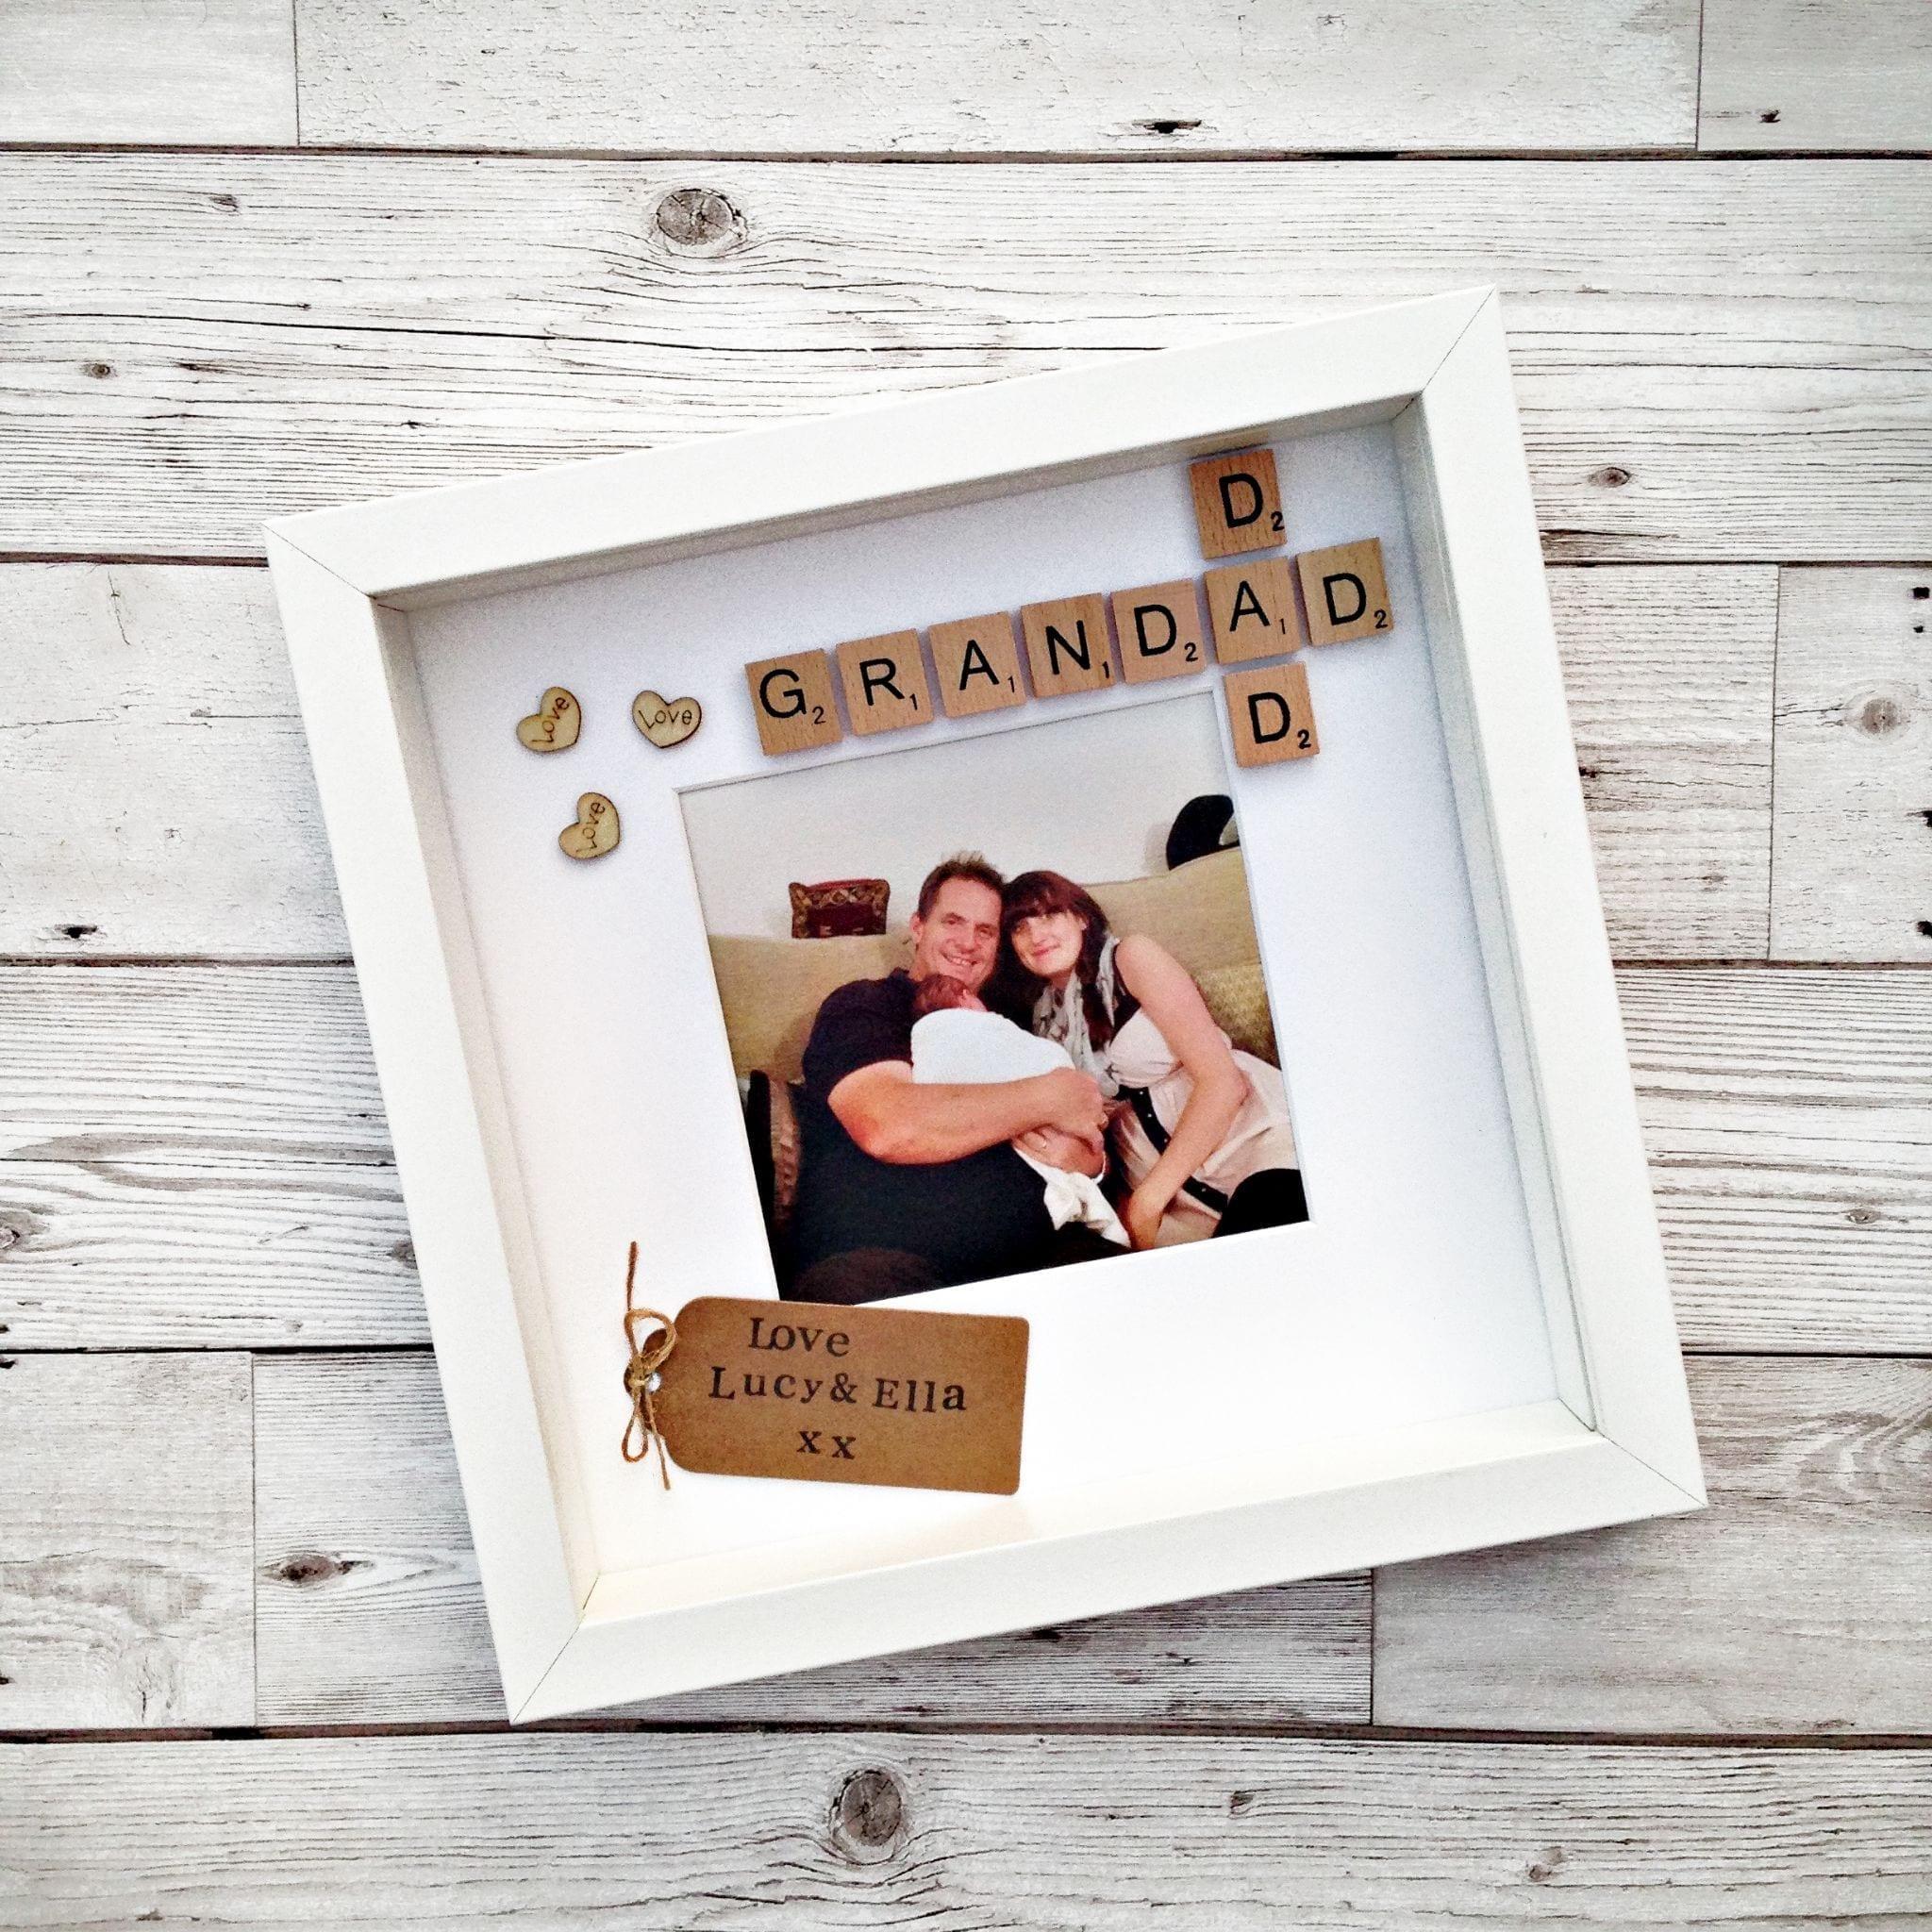 Dad and Grandad Scrabble Frame | Love Unique Personal